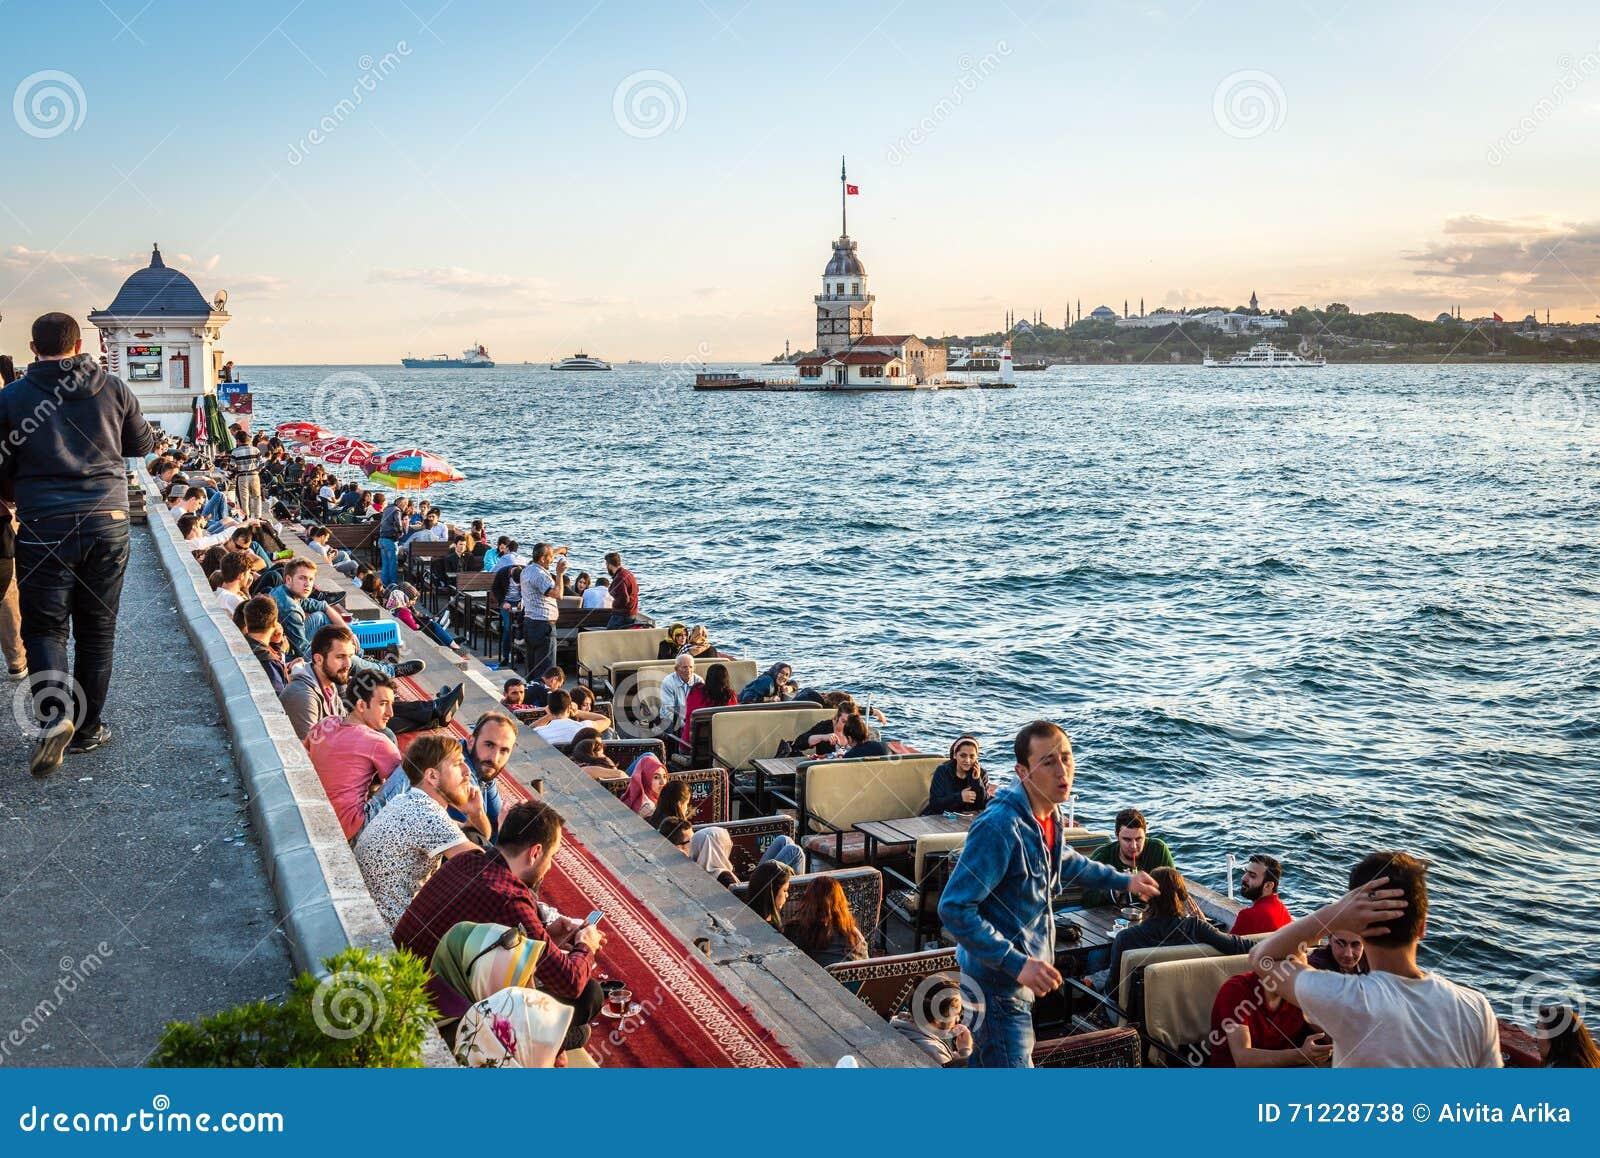 People on the coast of Bosphorus in Istanbul, Turkey